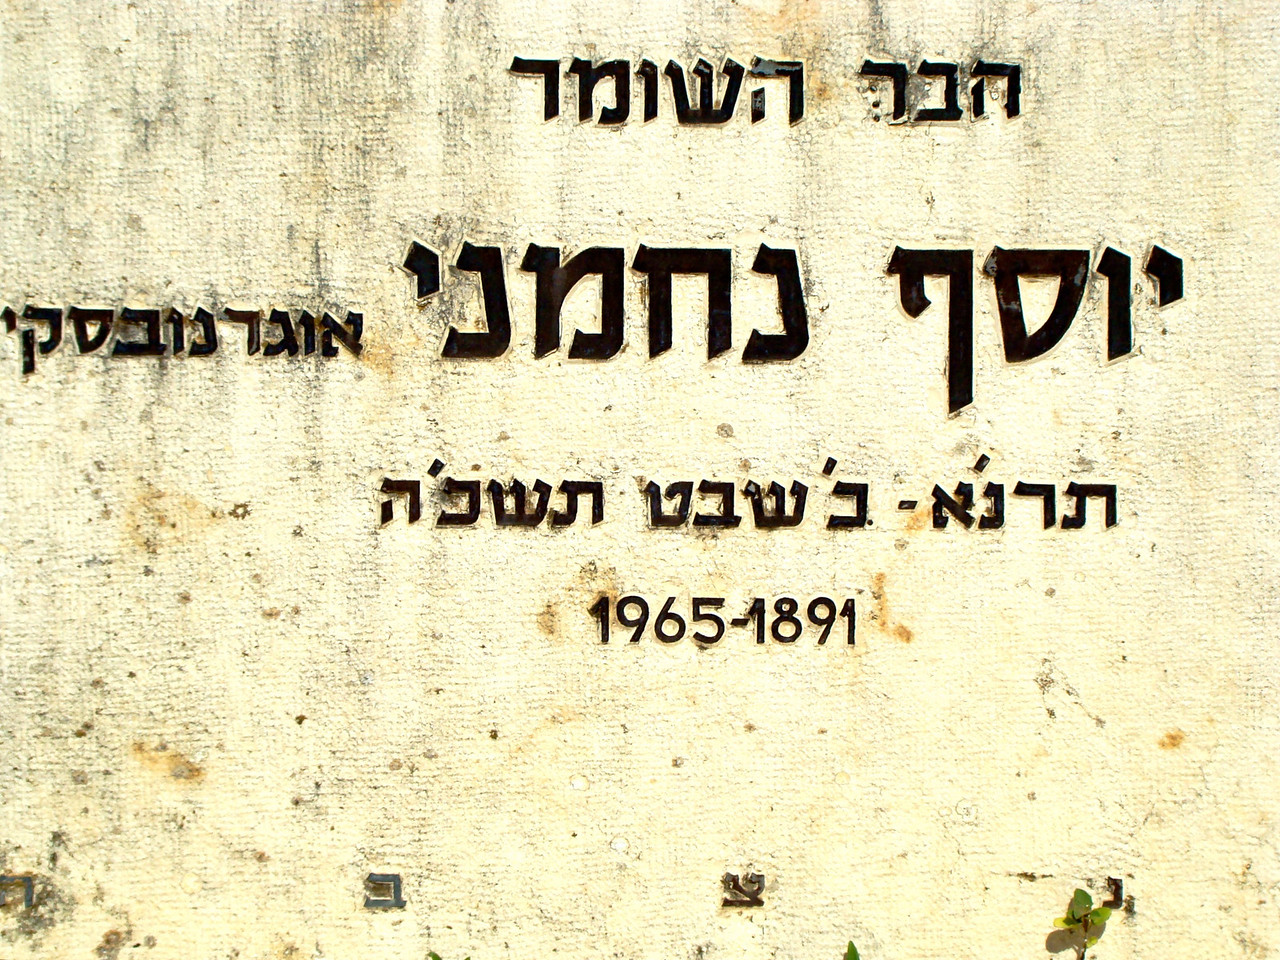 Tel Hai Cemetery- Haber Hashomer (Friend of Hashomer)